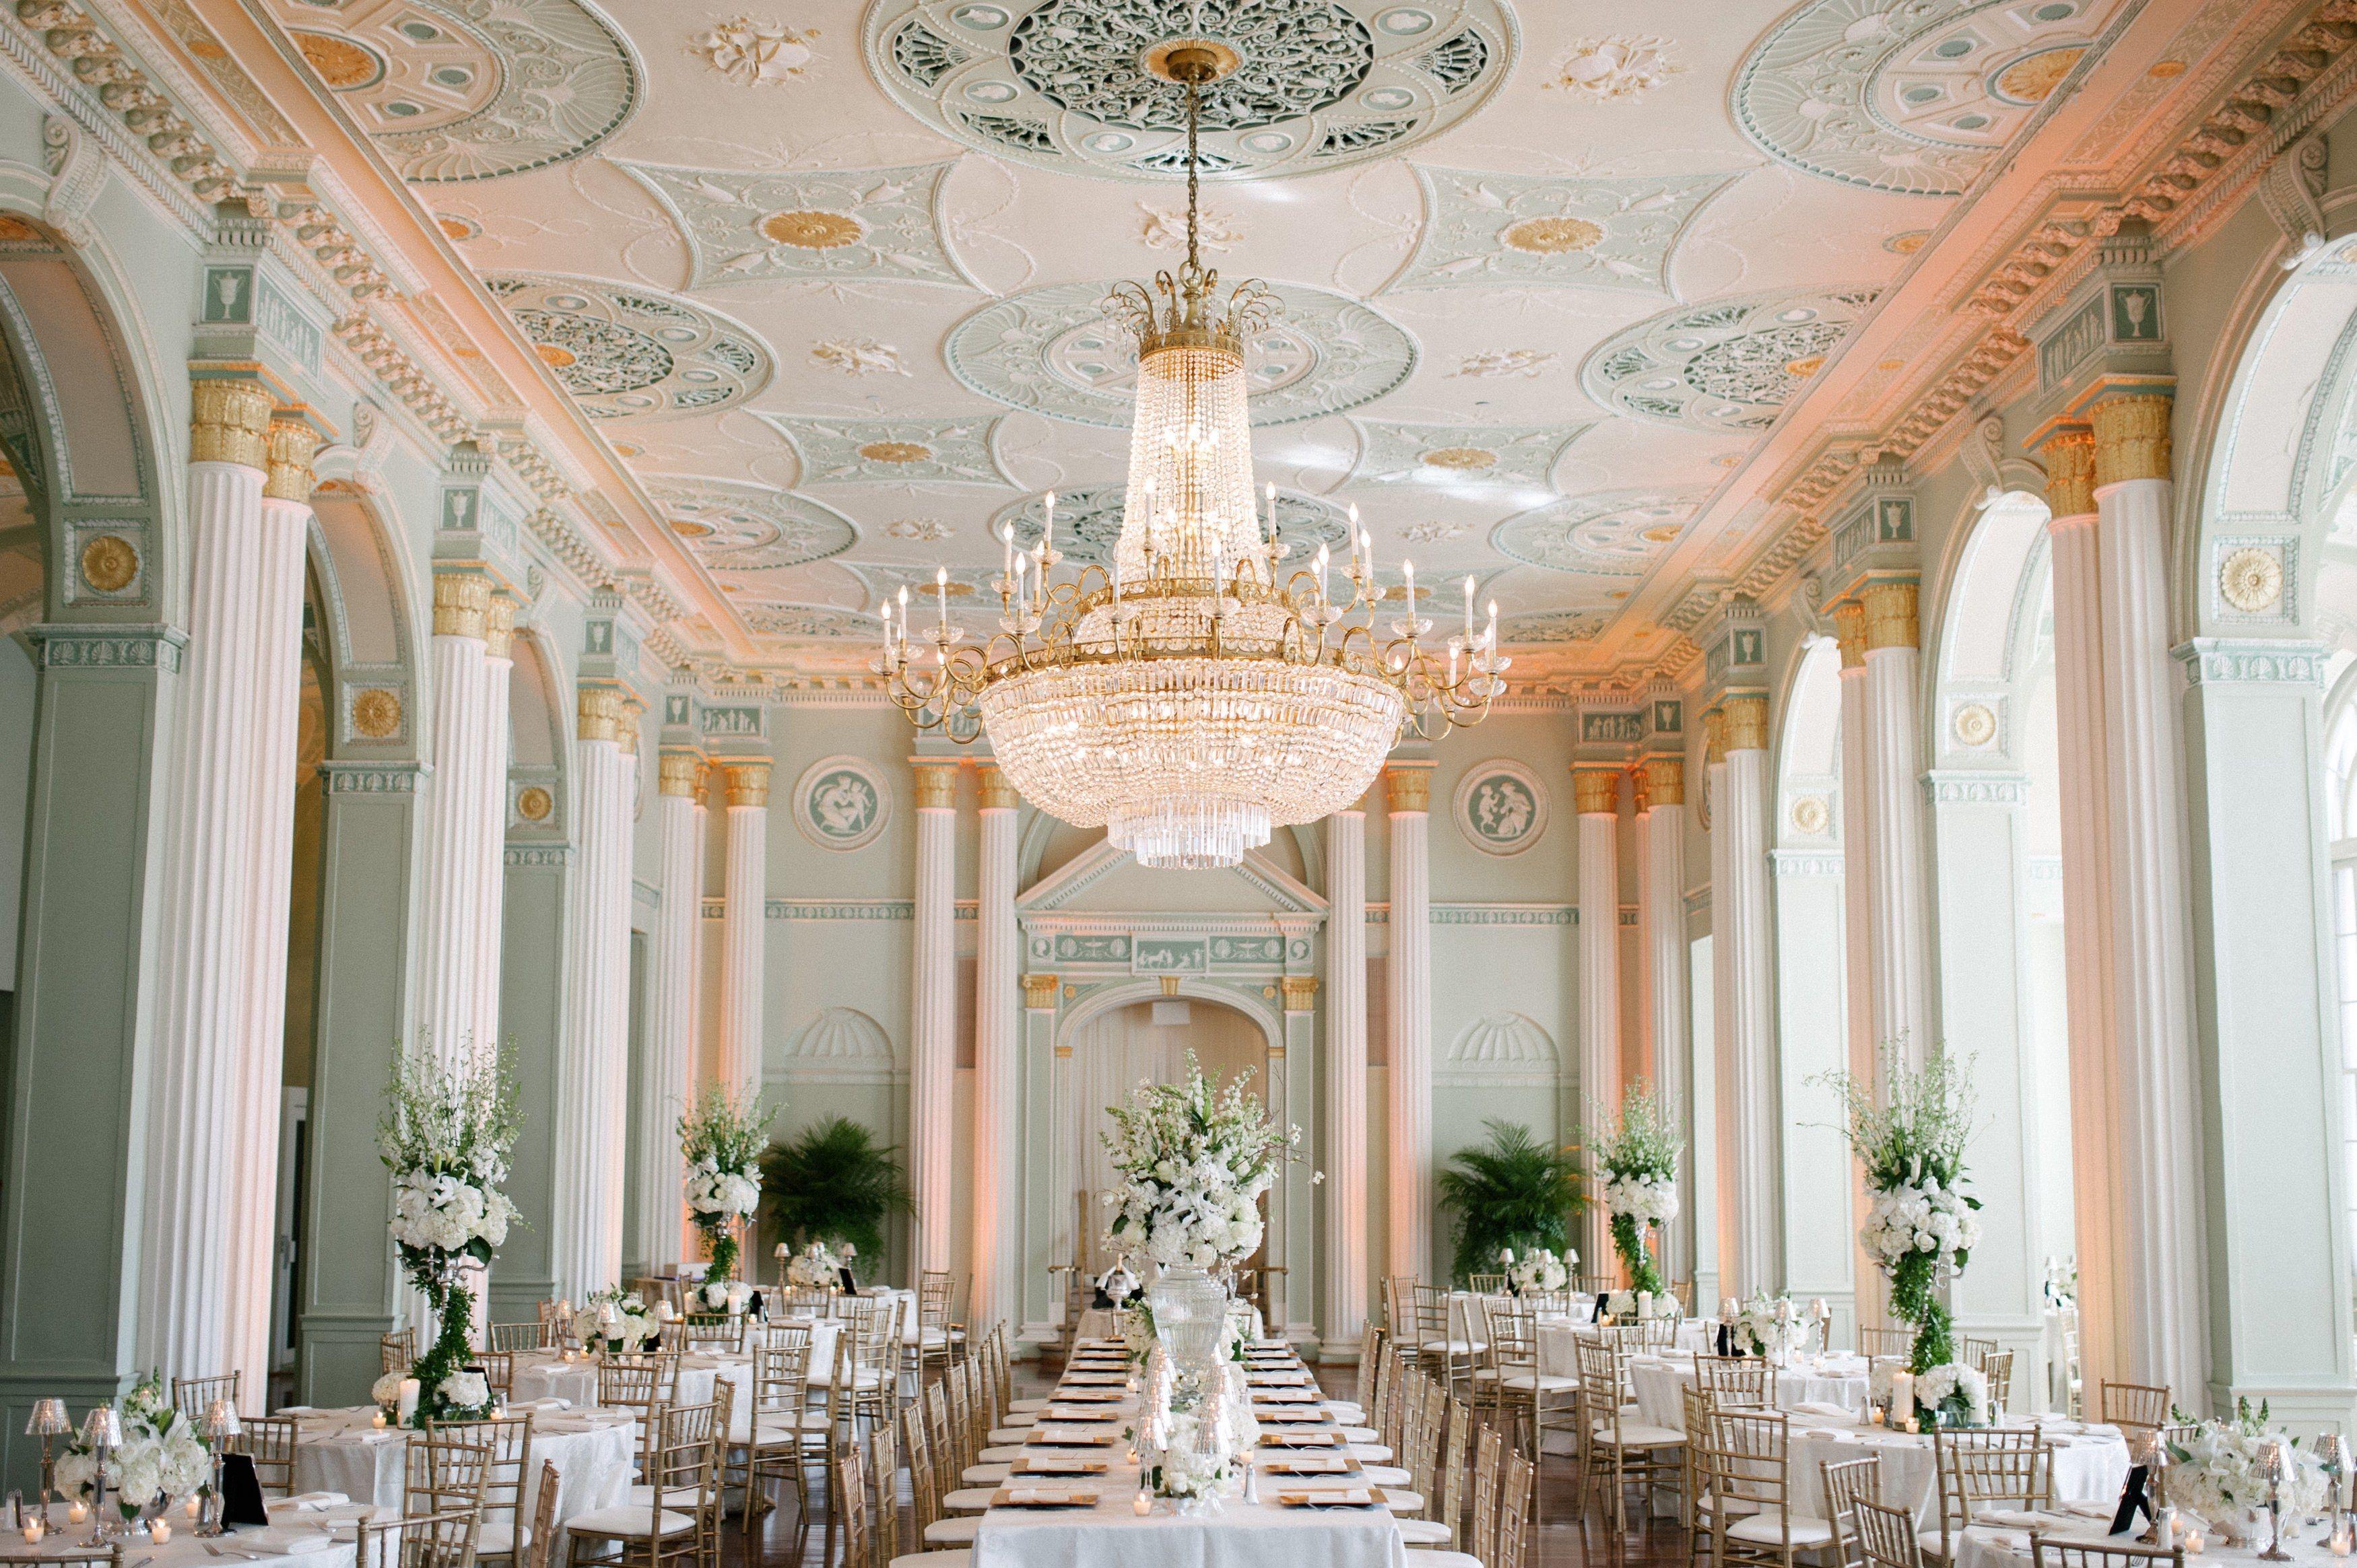 The Best Wedding Venues In The U S The Biltmore Ballrooms In Atlanta Georgia Wedding Georgia Wedding Future Wedding Plans